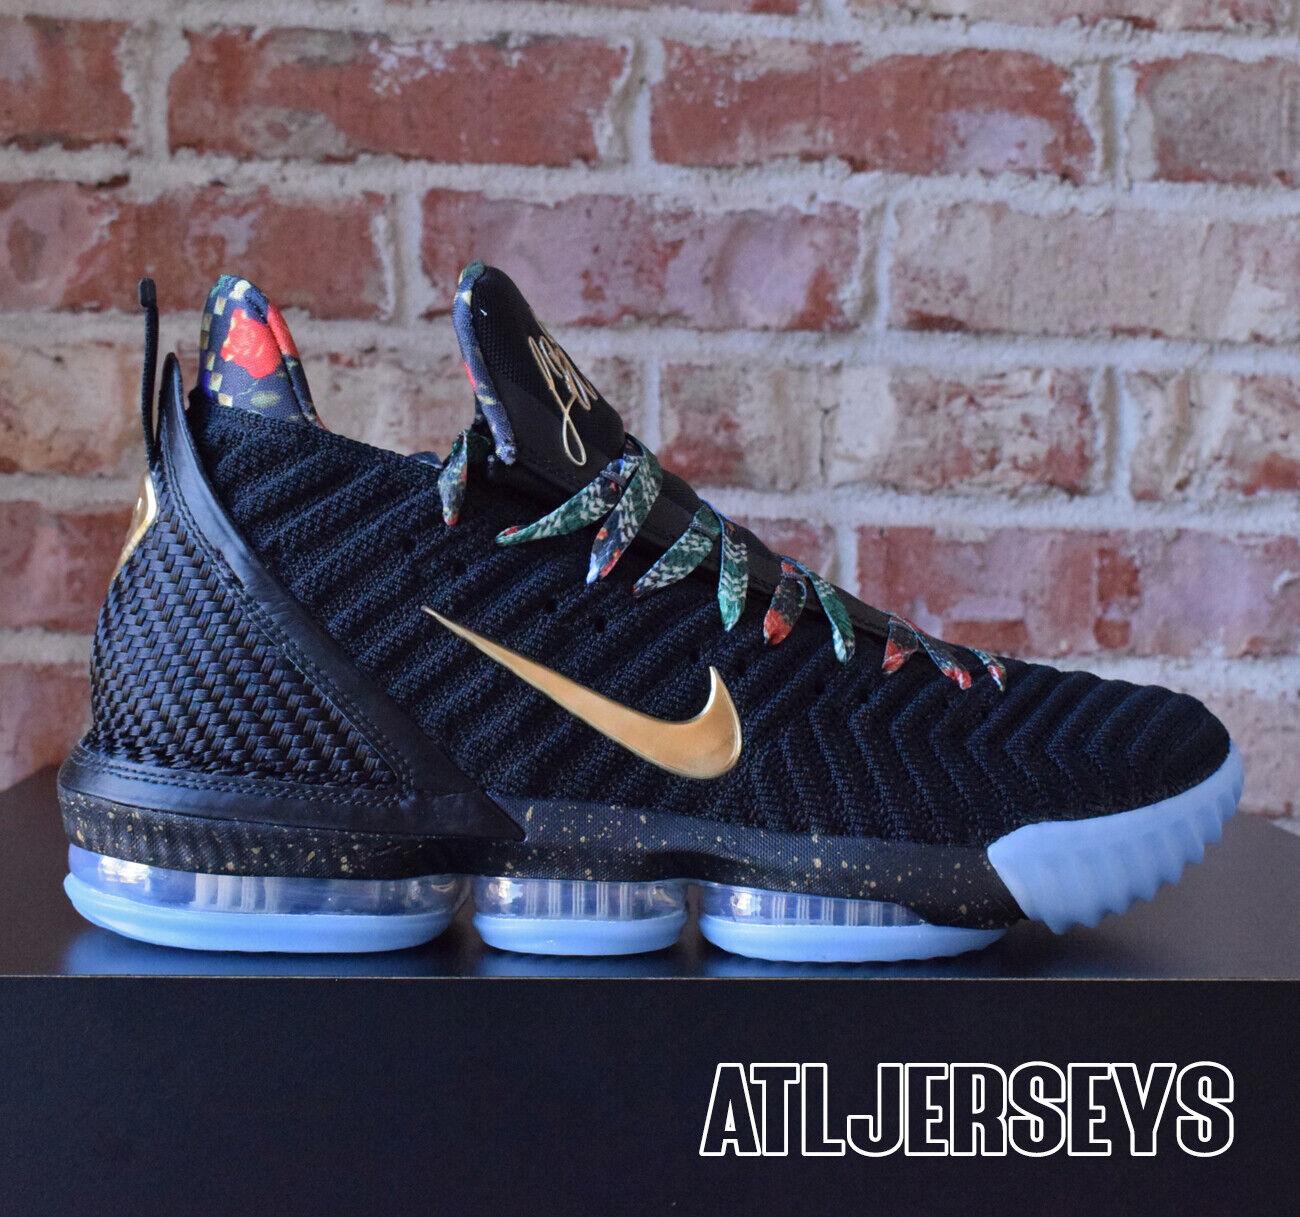 Nike Lebron XVI 16 KC Watch the Throne WTT Black gold CI1518-001 Size